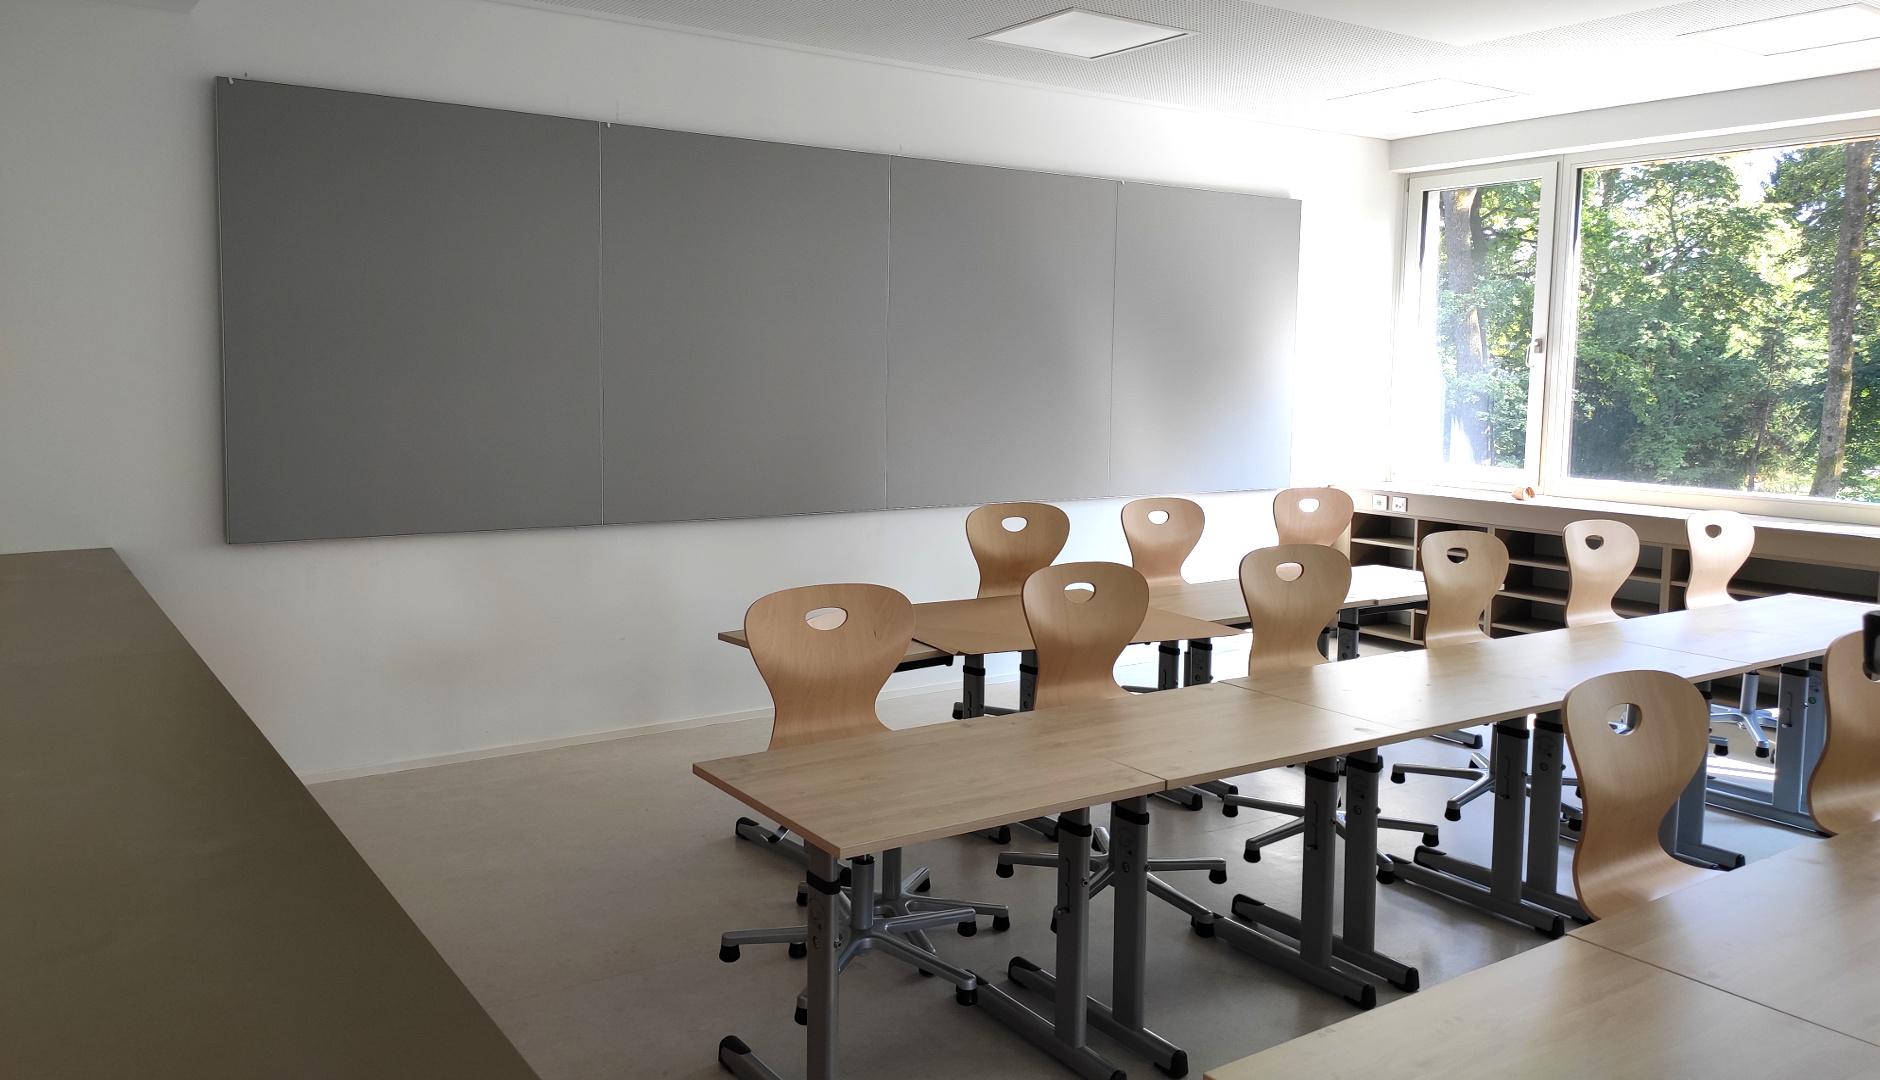 Rehrl Schule Salzburg, Wandabsorber als Rückwandpaneel